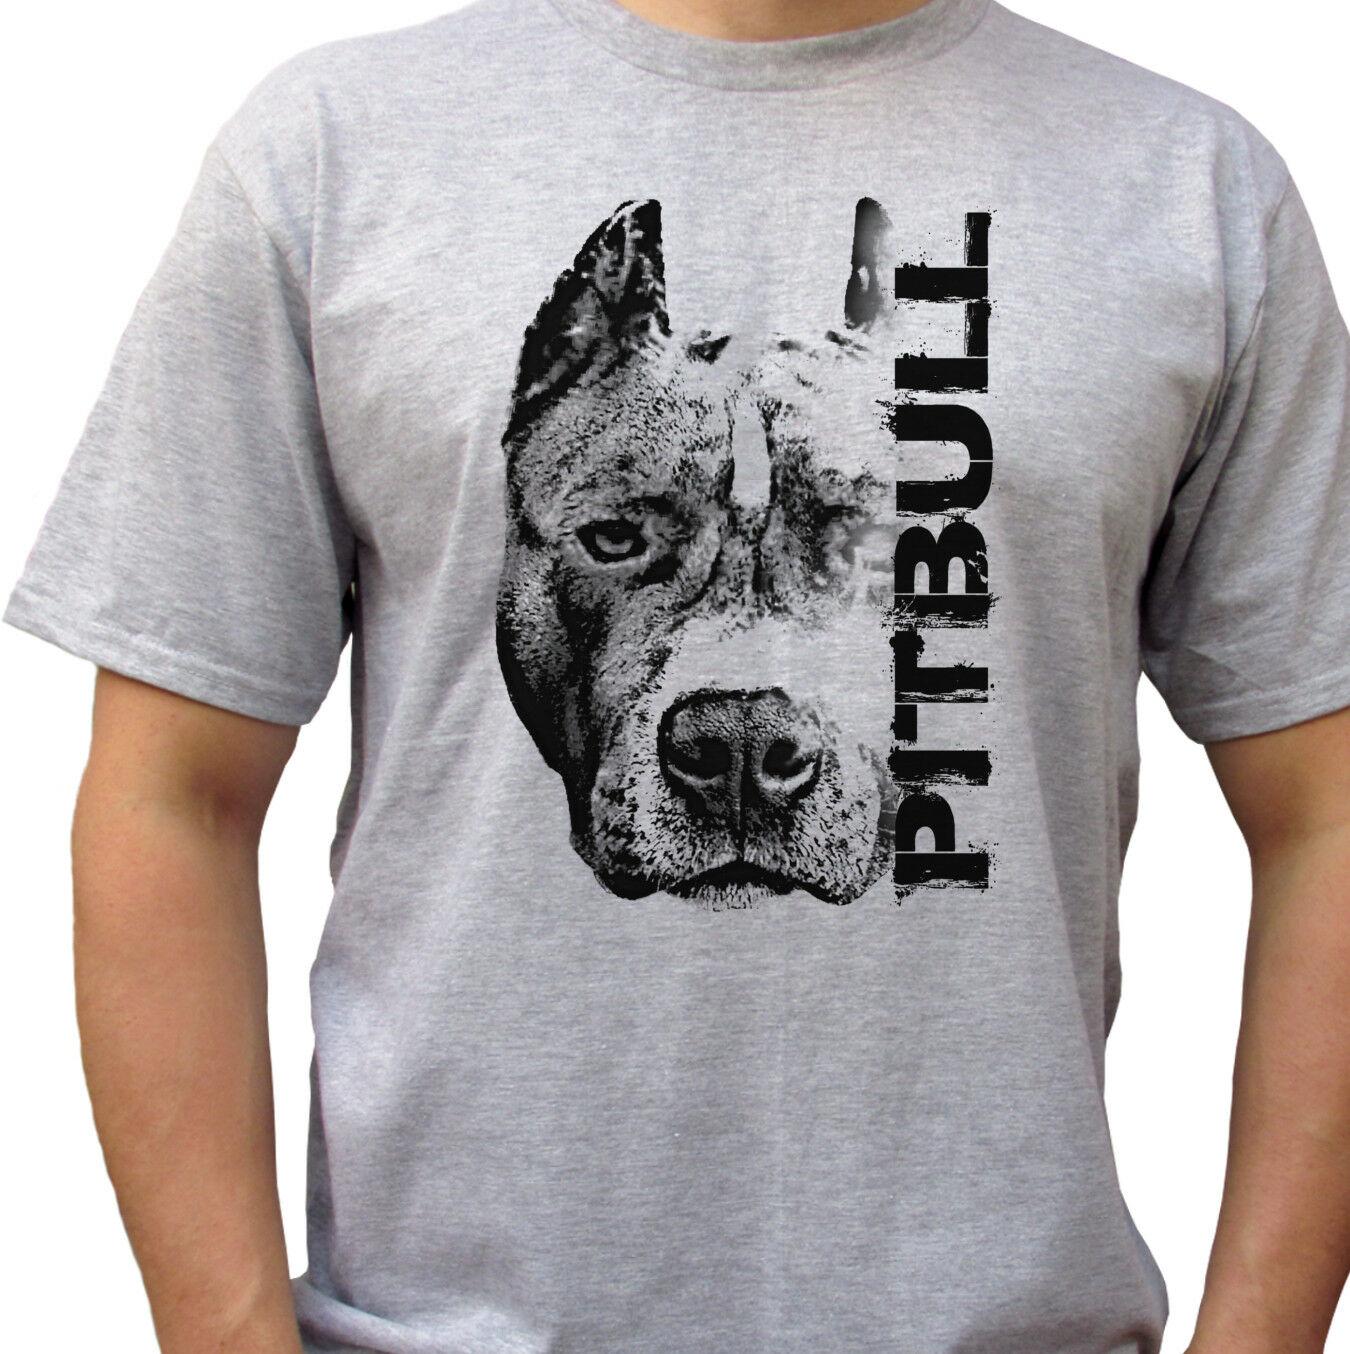 Pitbull голова серая футболка Топ питбулл футболка собака дизайн Мужские размеры